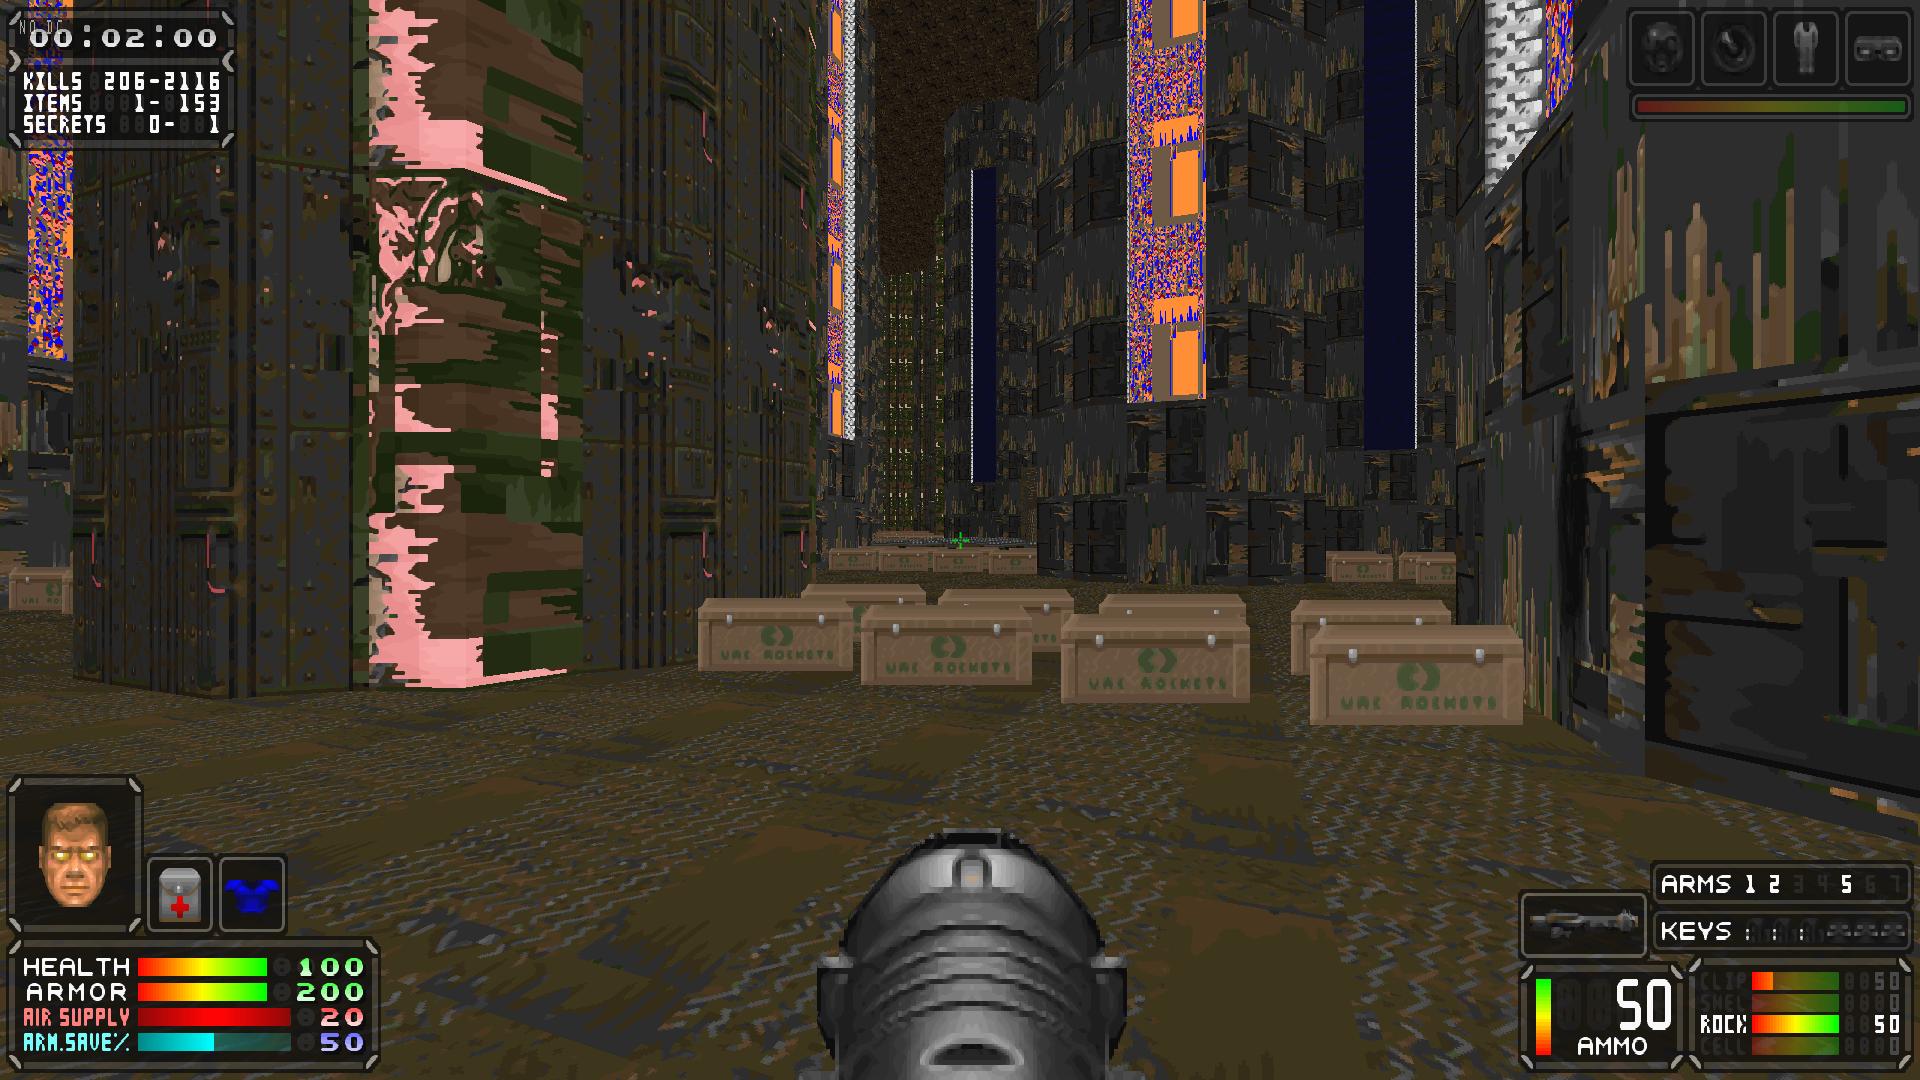 Screenshot_Doom_20210821_155304.png.391dc67f91ba422acc239a9732bd92bf.png